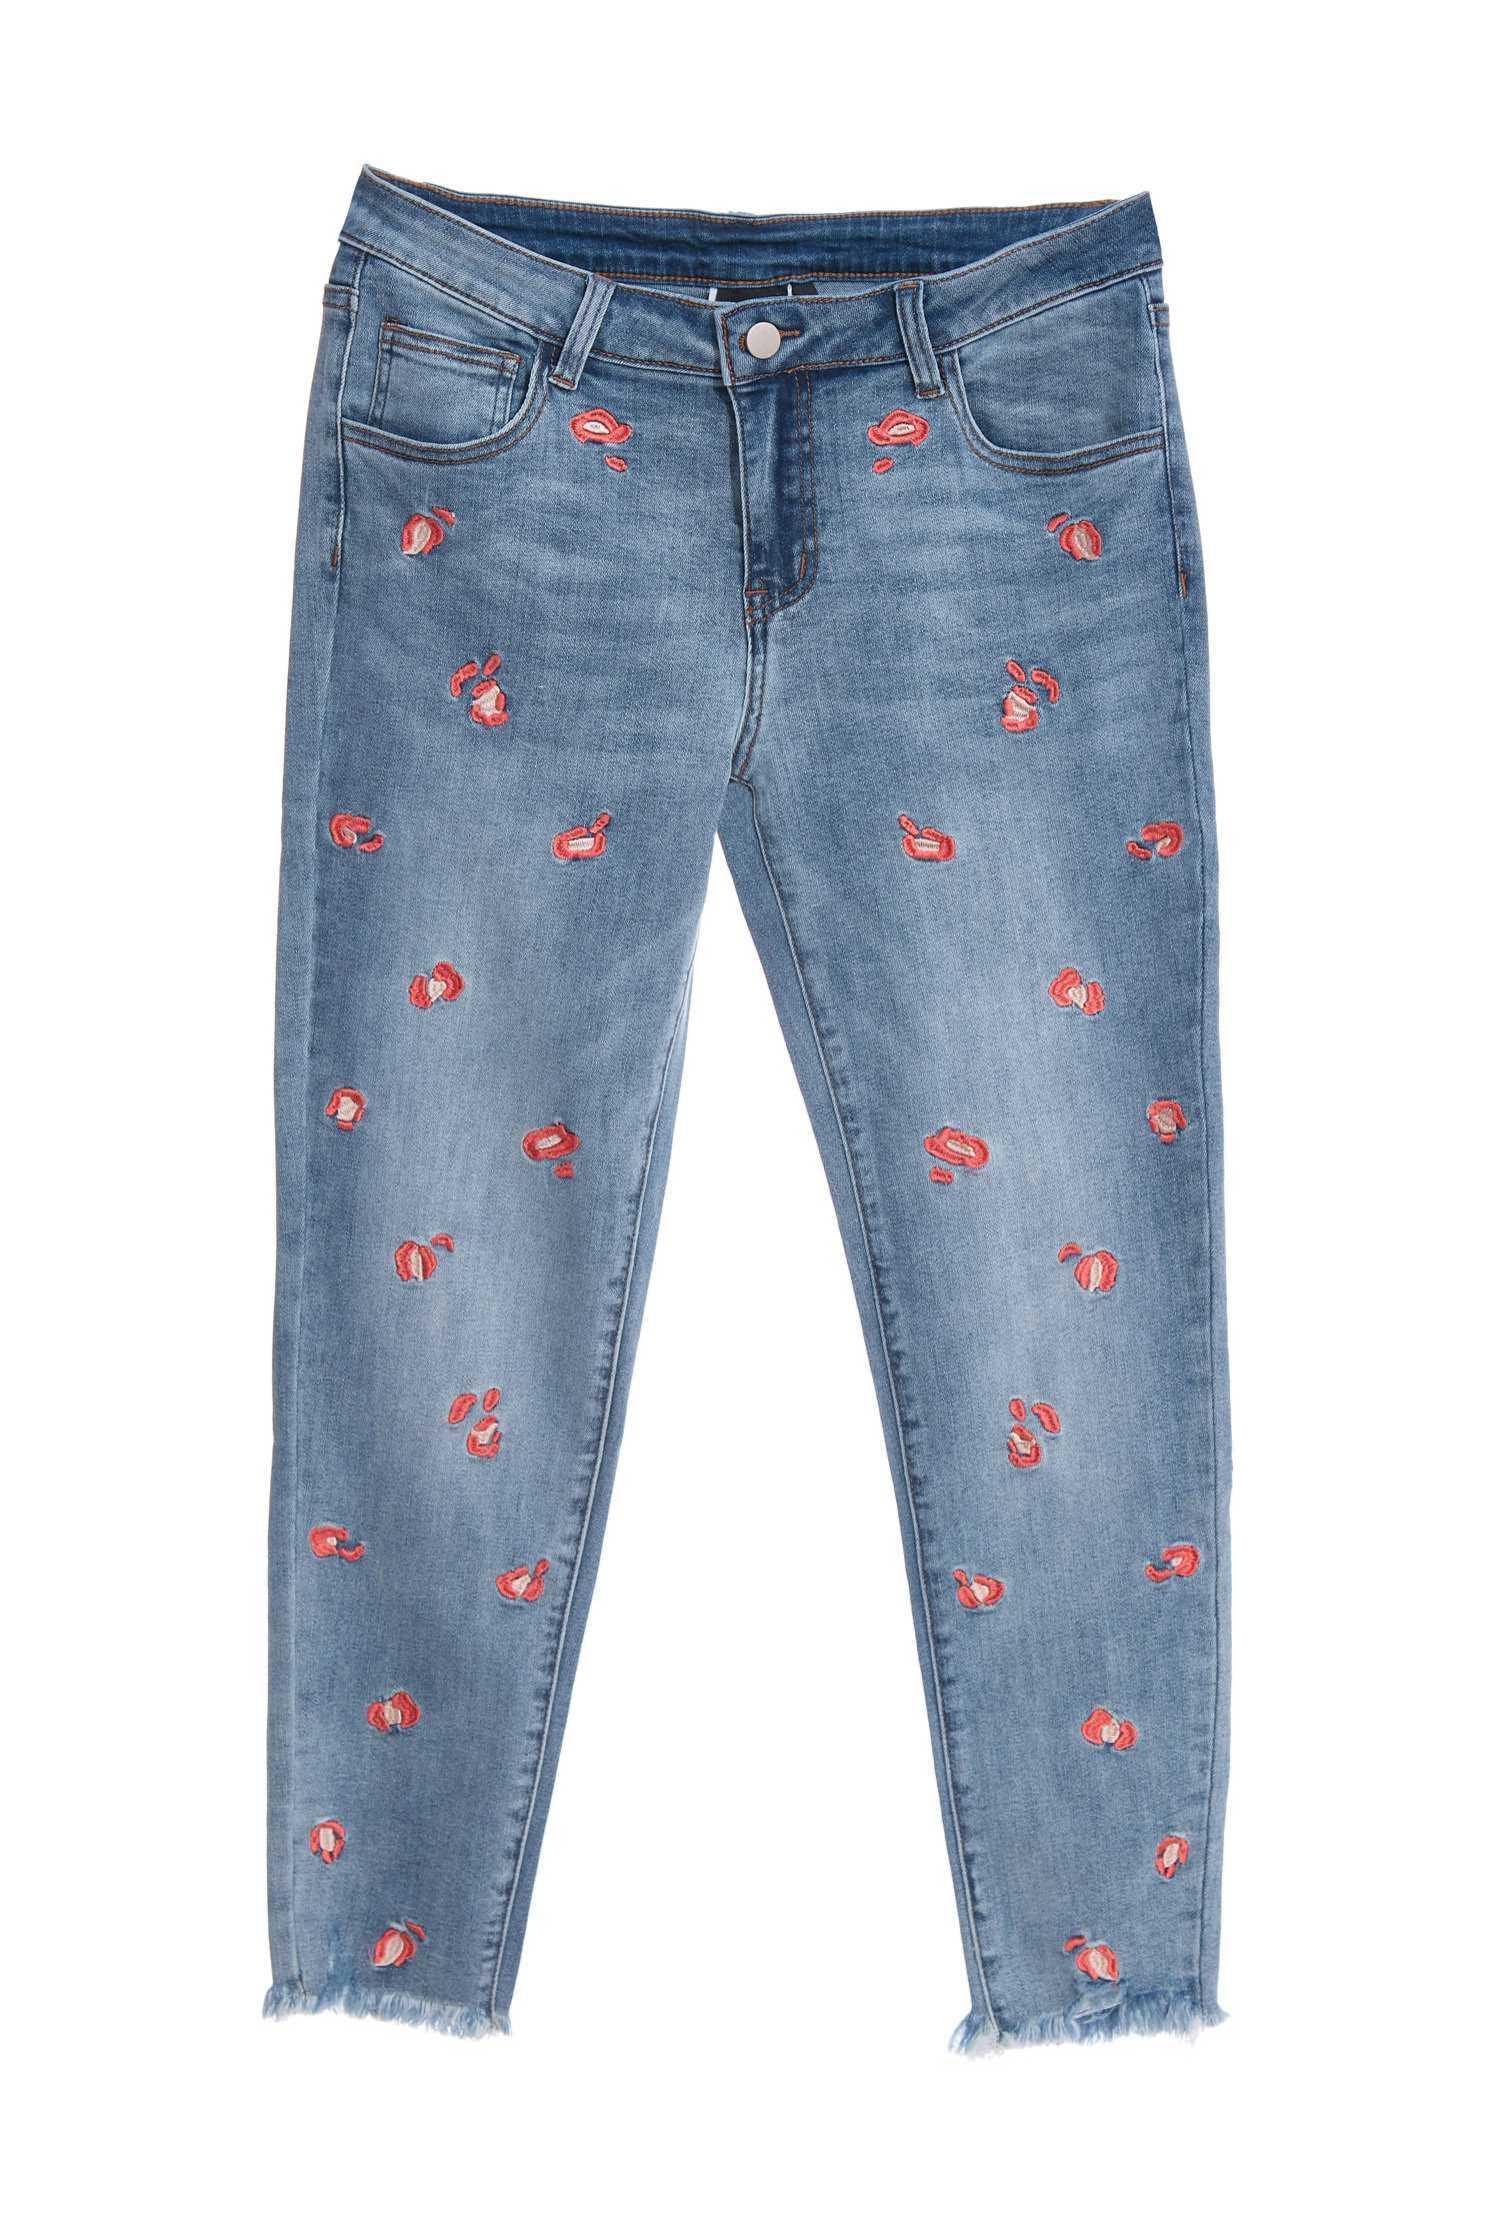 Irregular leopard print jeans